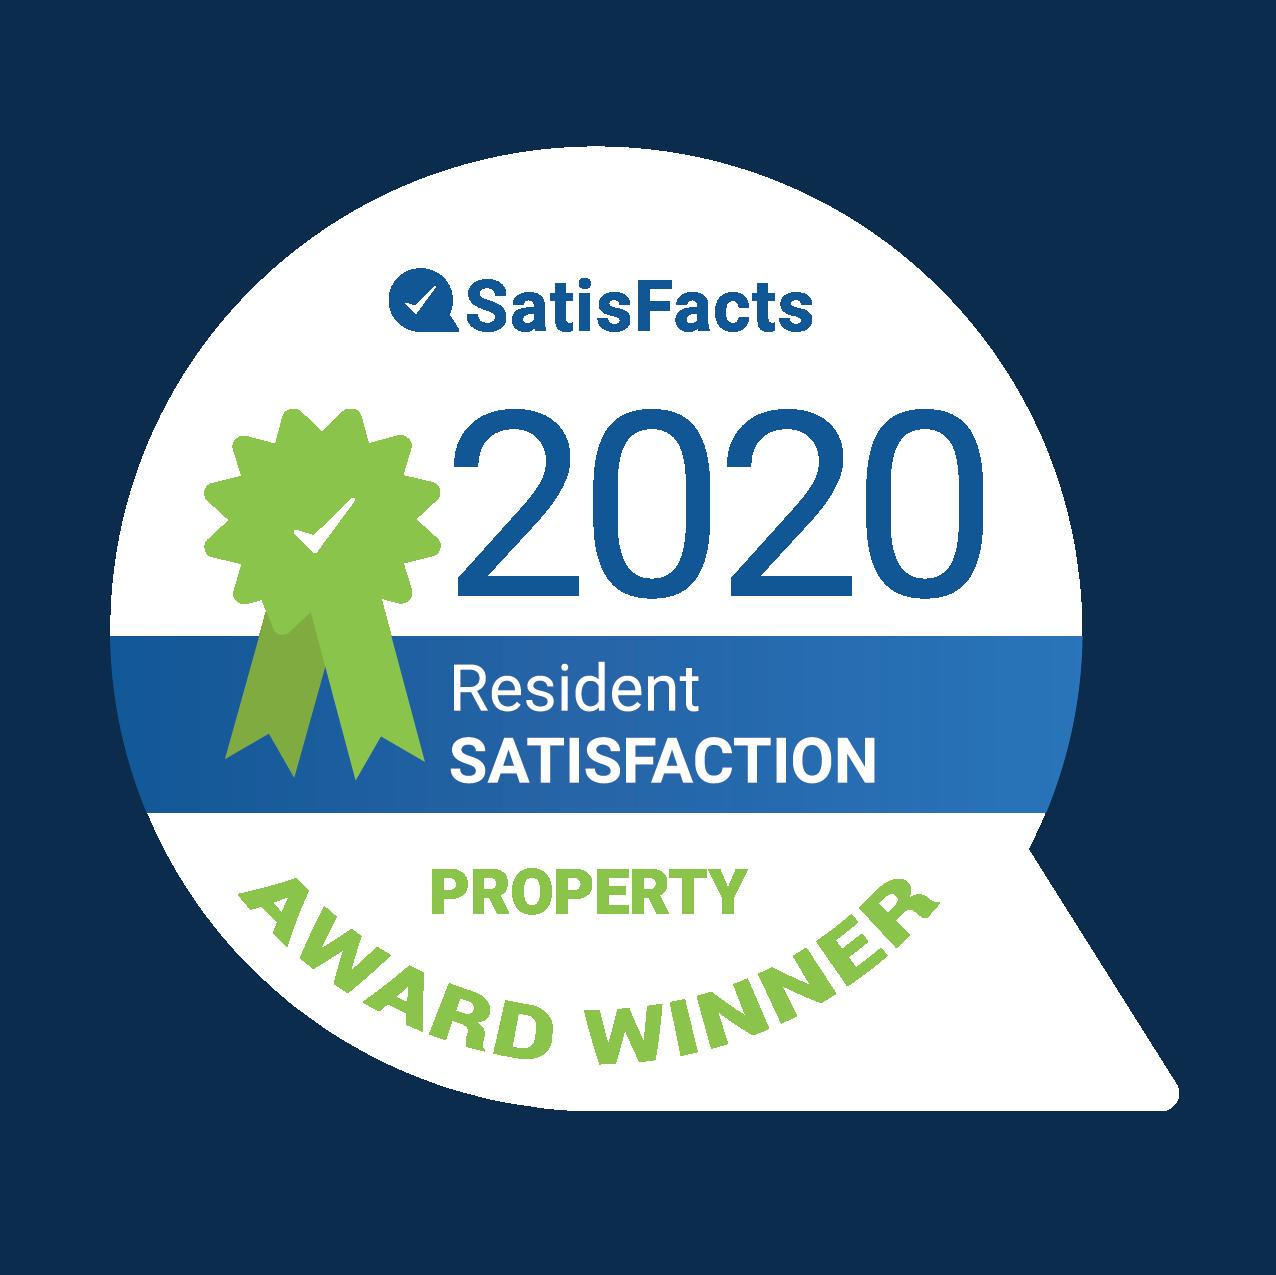 Satisfacts National Award